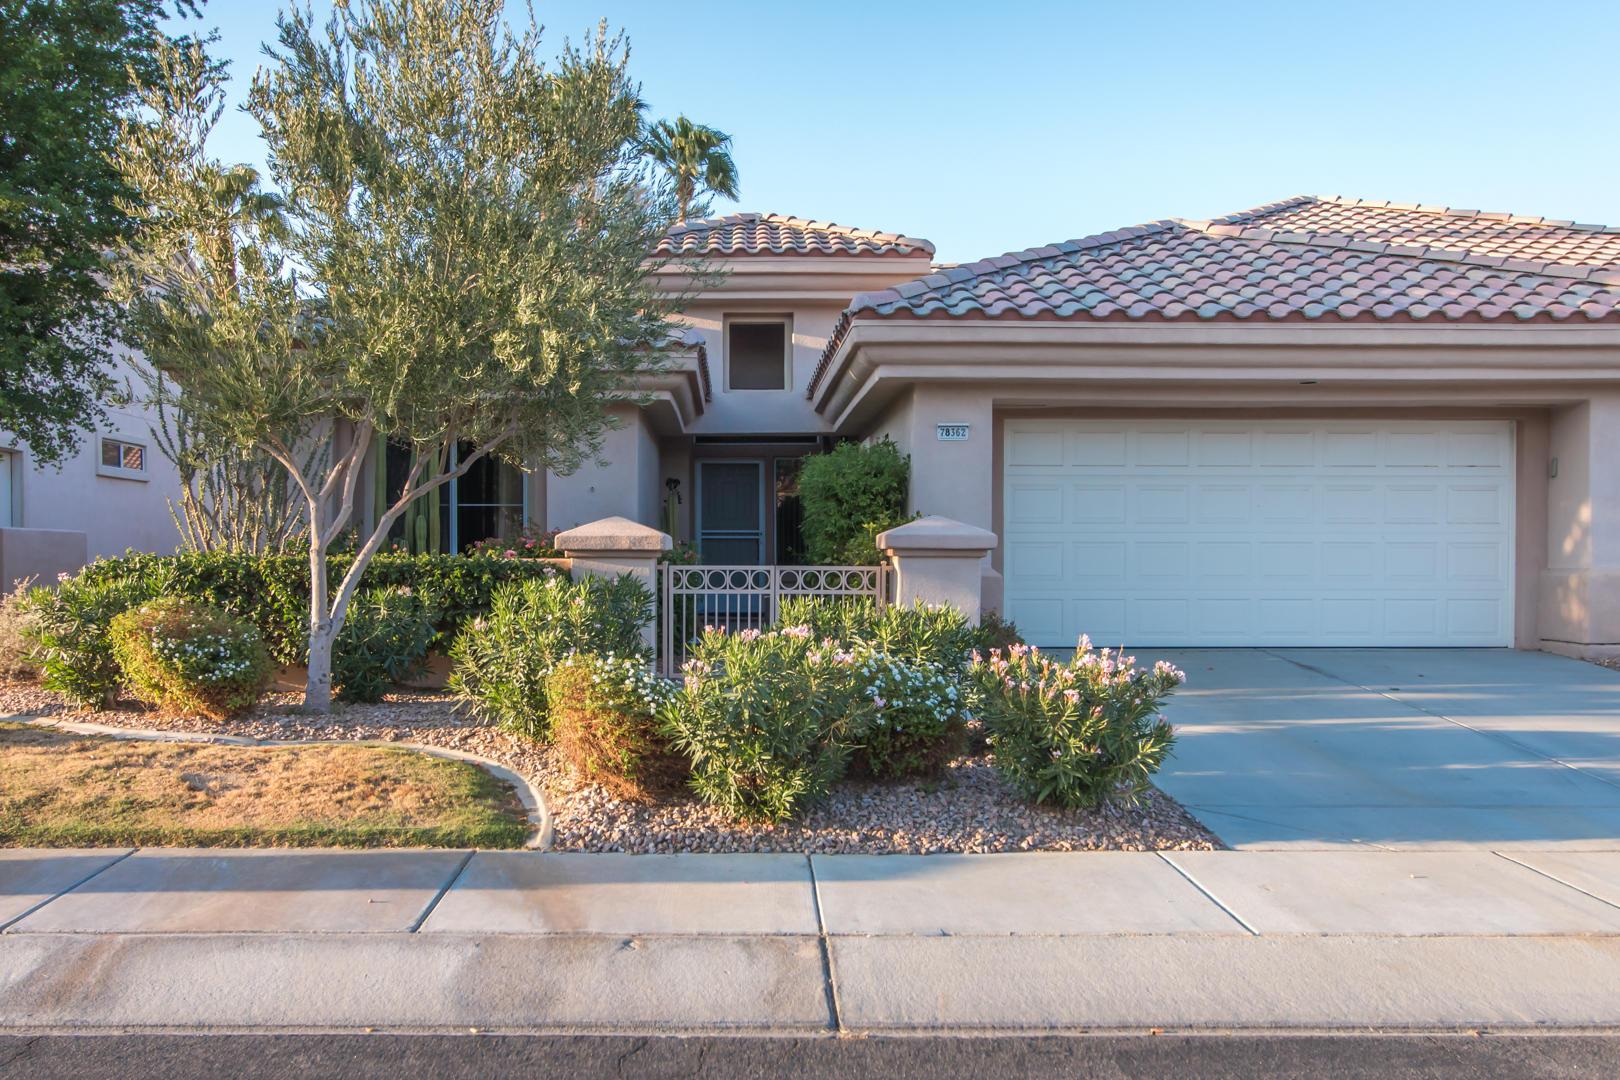 Photo of 78362 Yucca Blossom Drive, Palm Desert, CA 92211